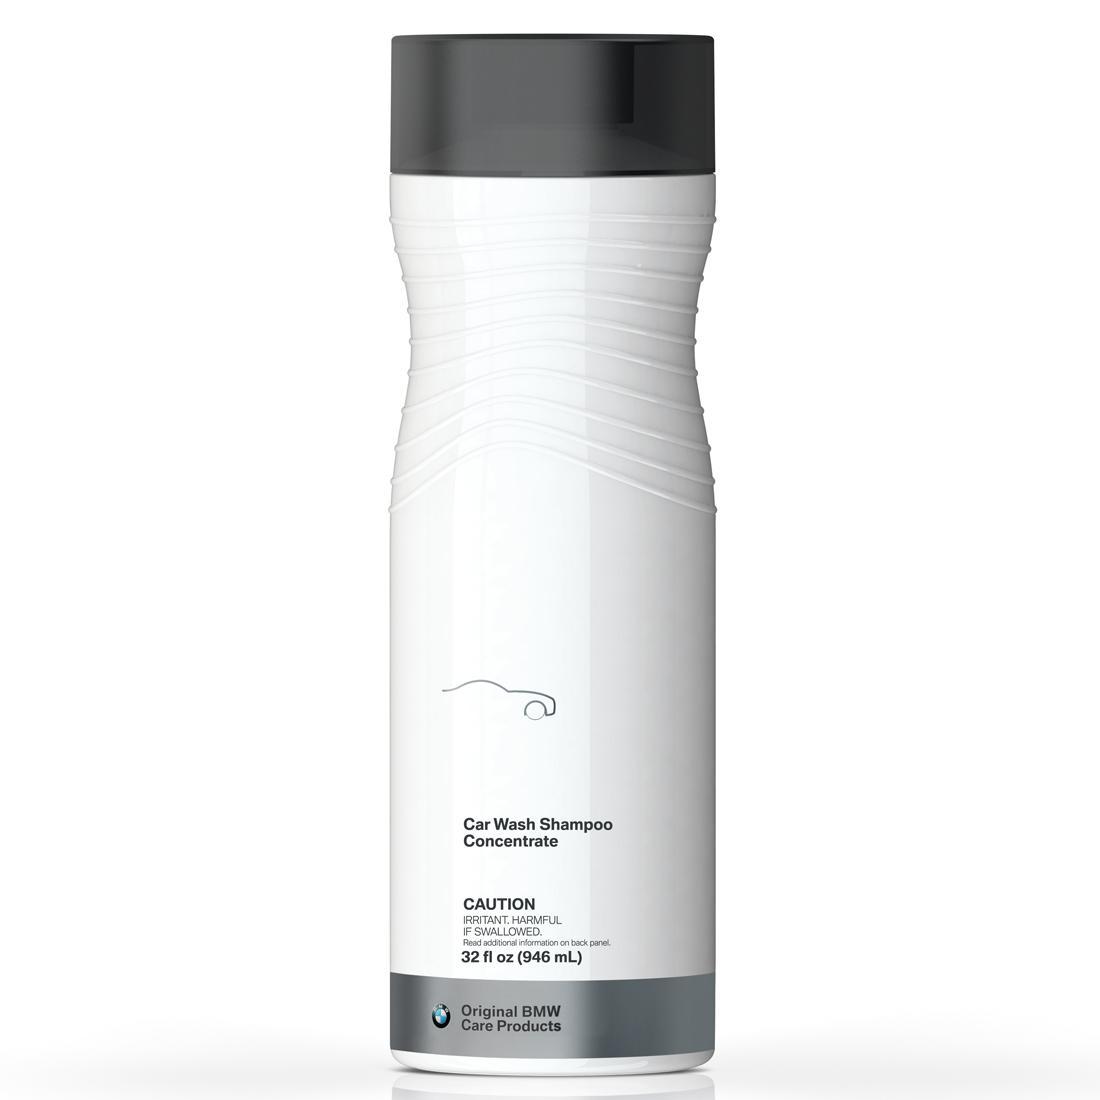 BMW Car Wash Shampoo Concentrate